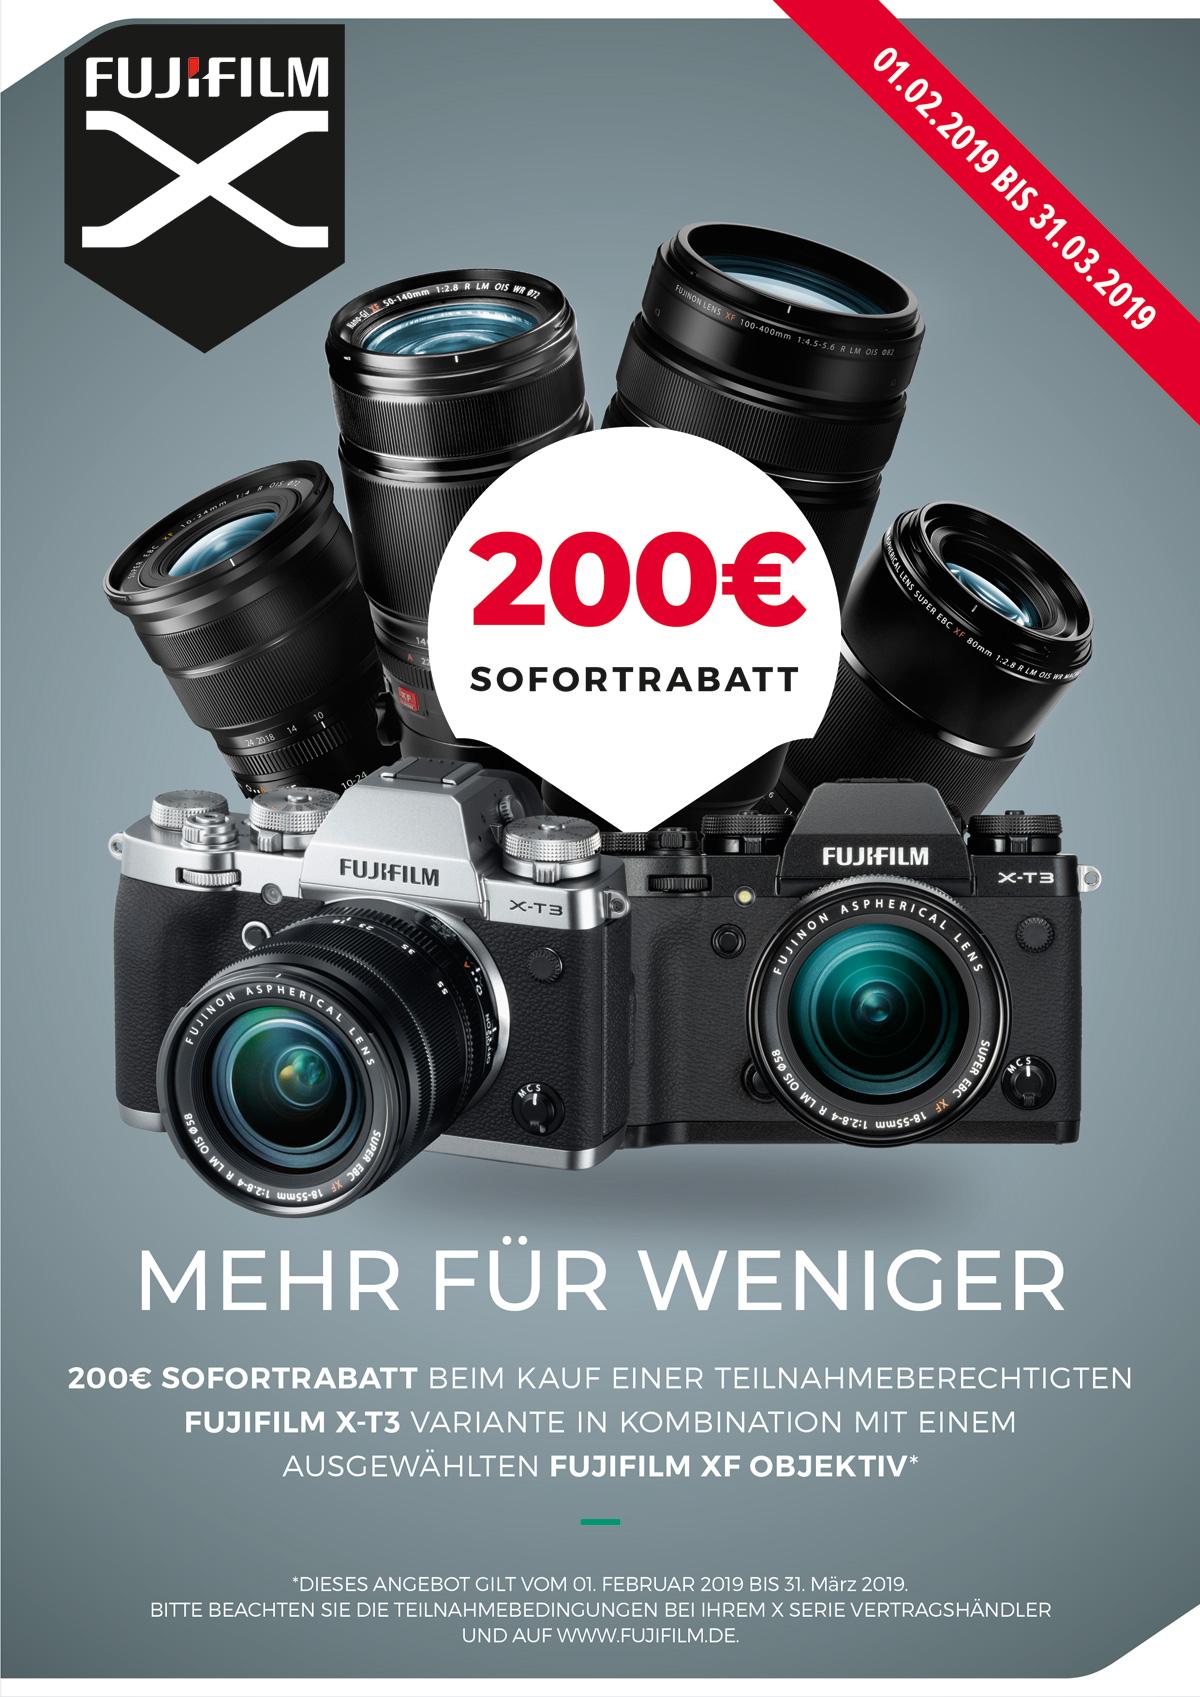 Fujifilm X-T3 Sets Sofortrabatt